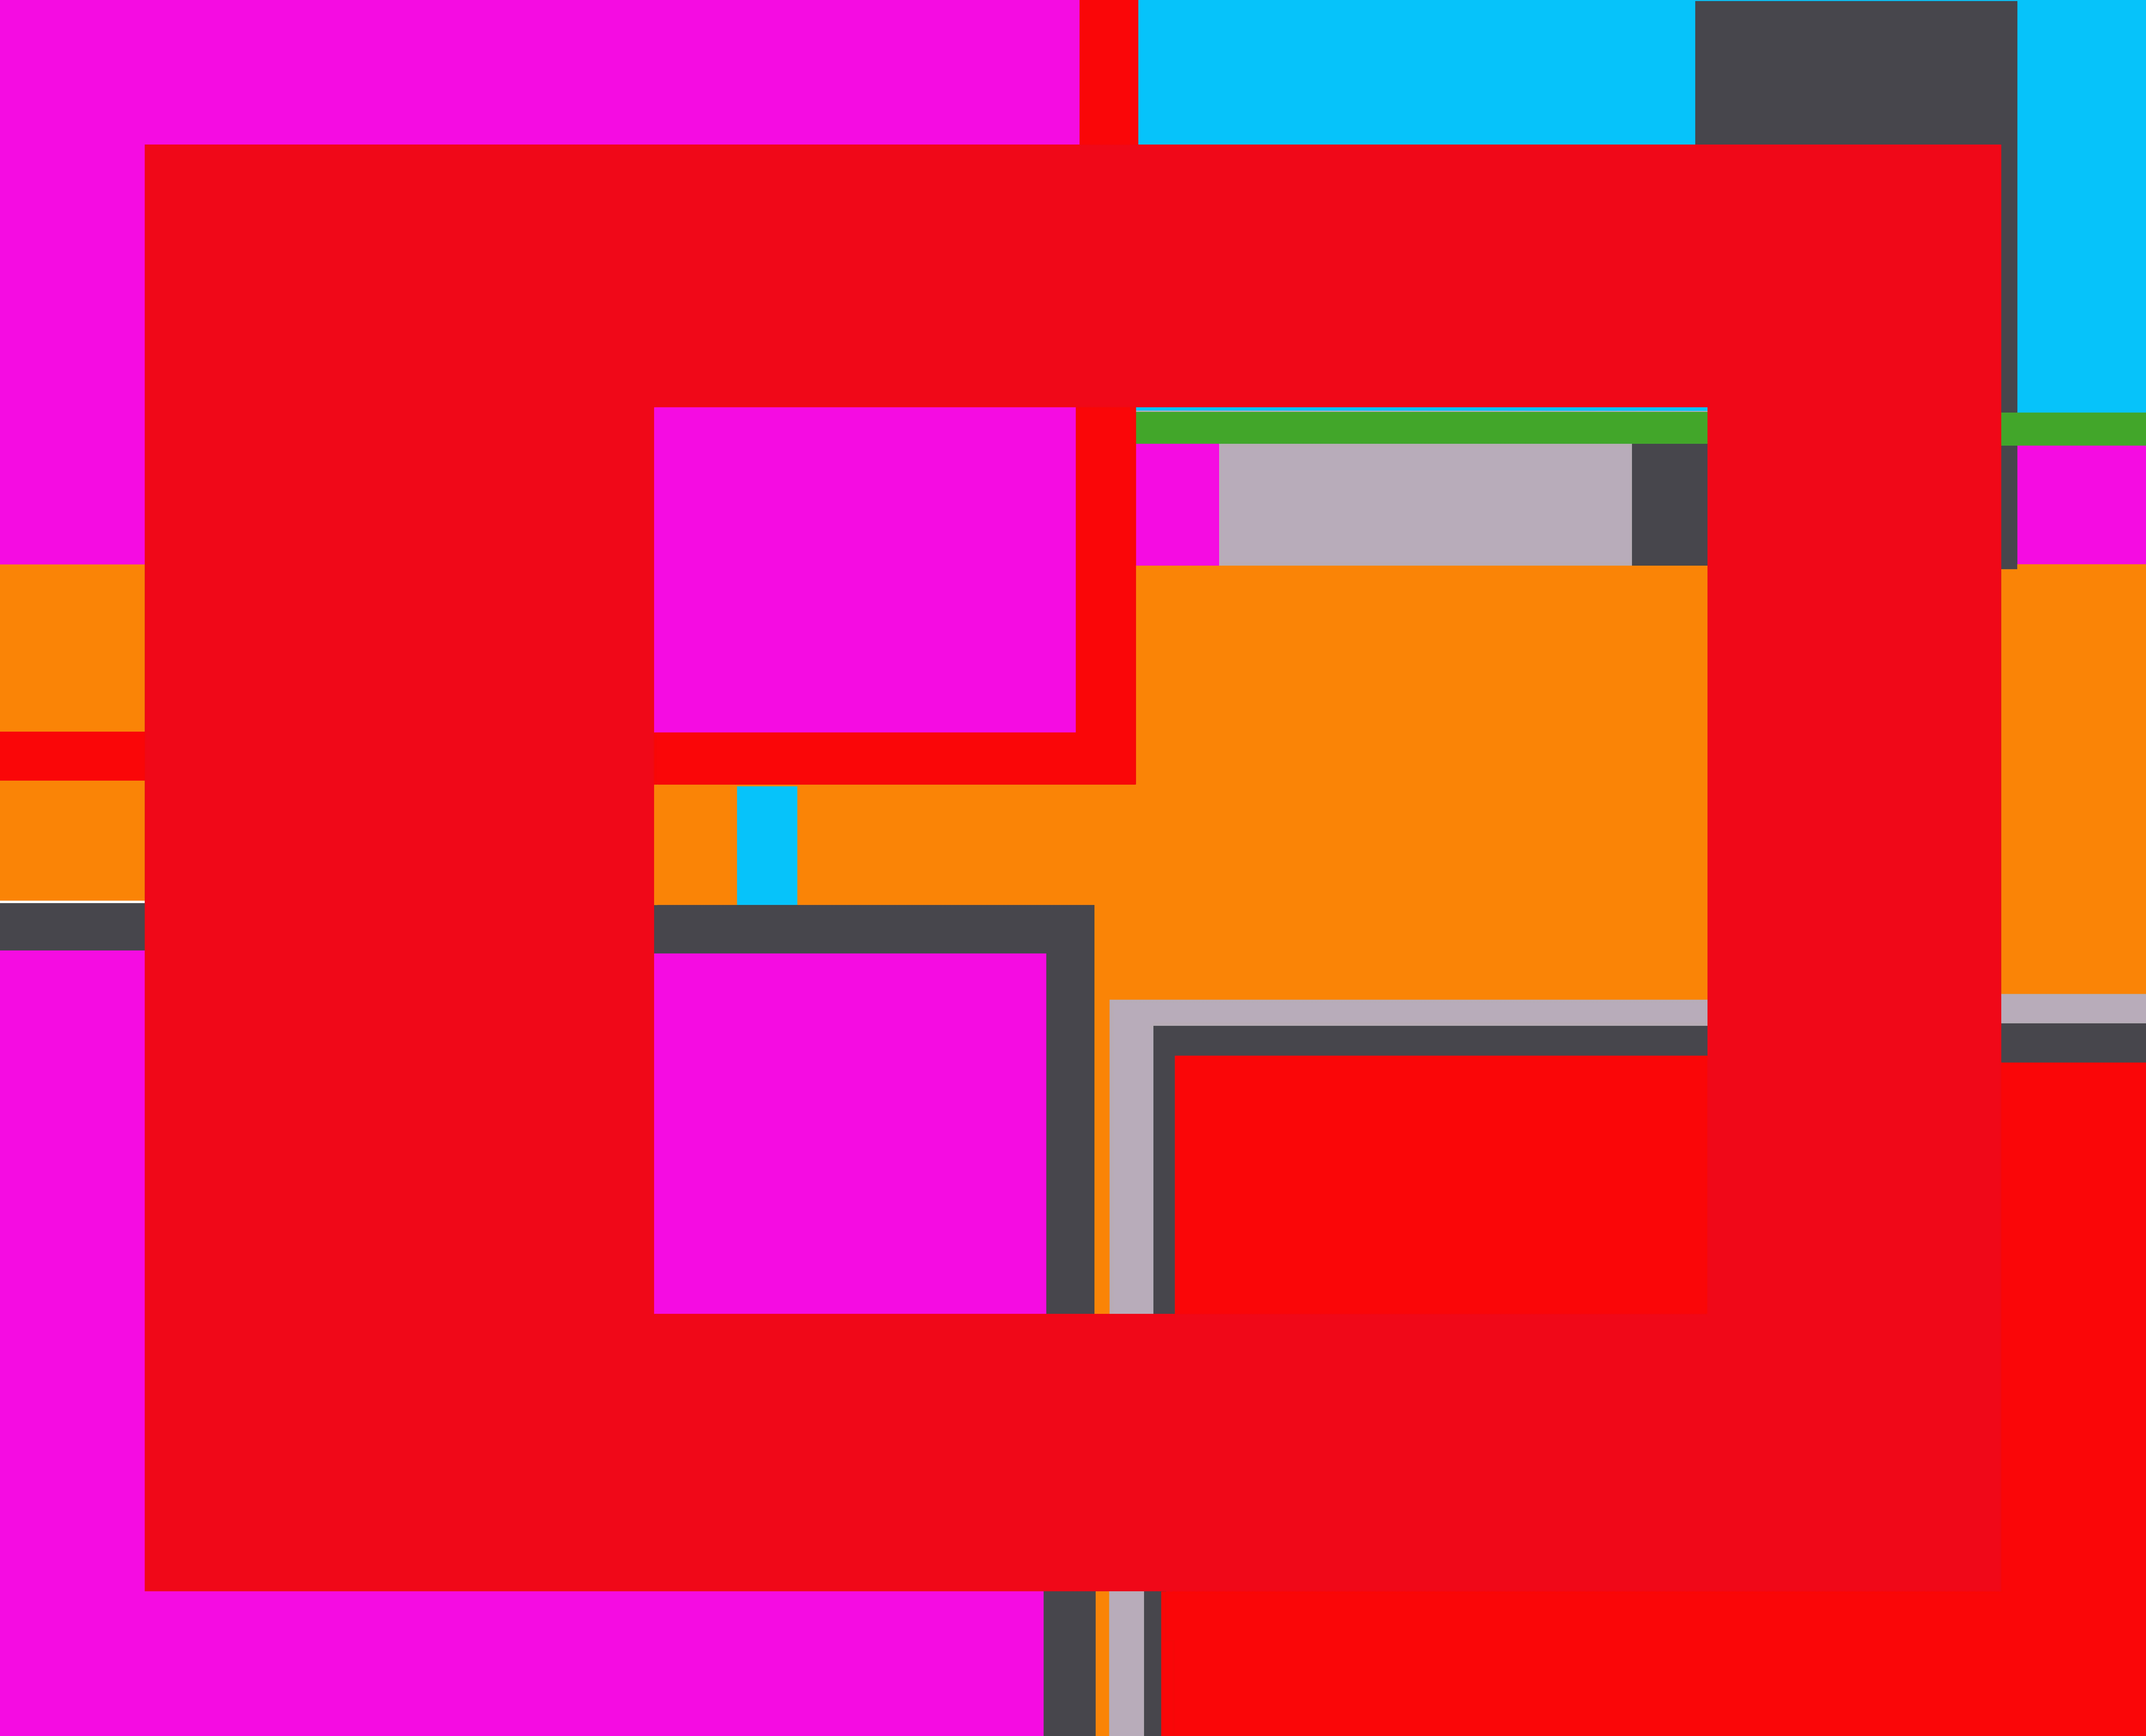 9058_c_2_2016_ כולל שוליים חיצוניים 6 סממרובעים עץ תלת מימיד